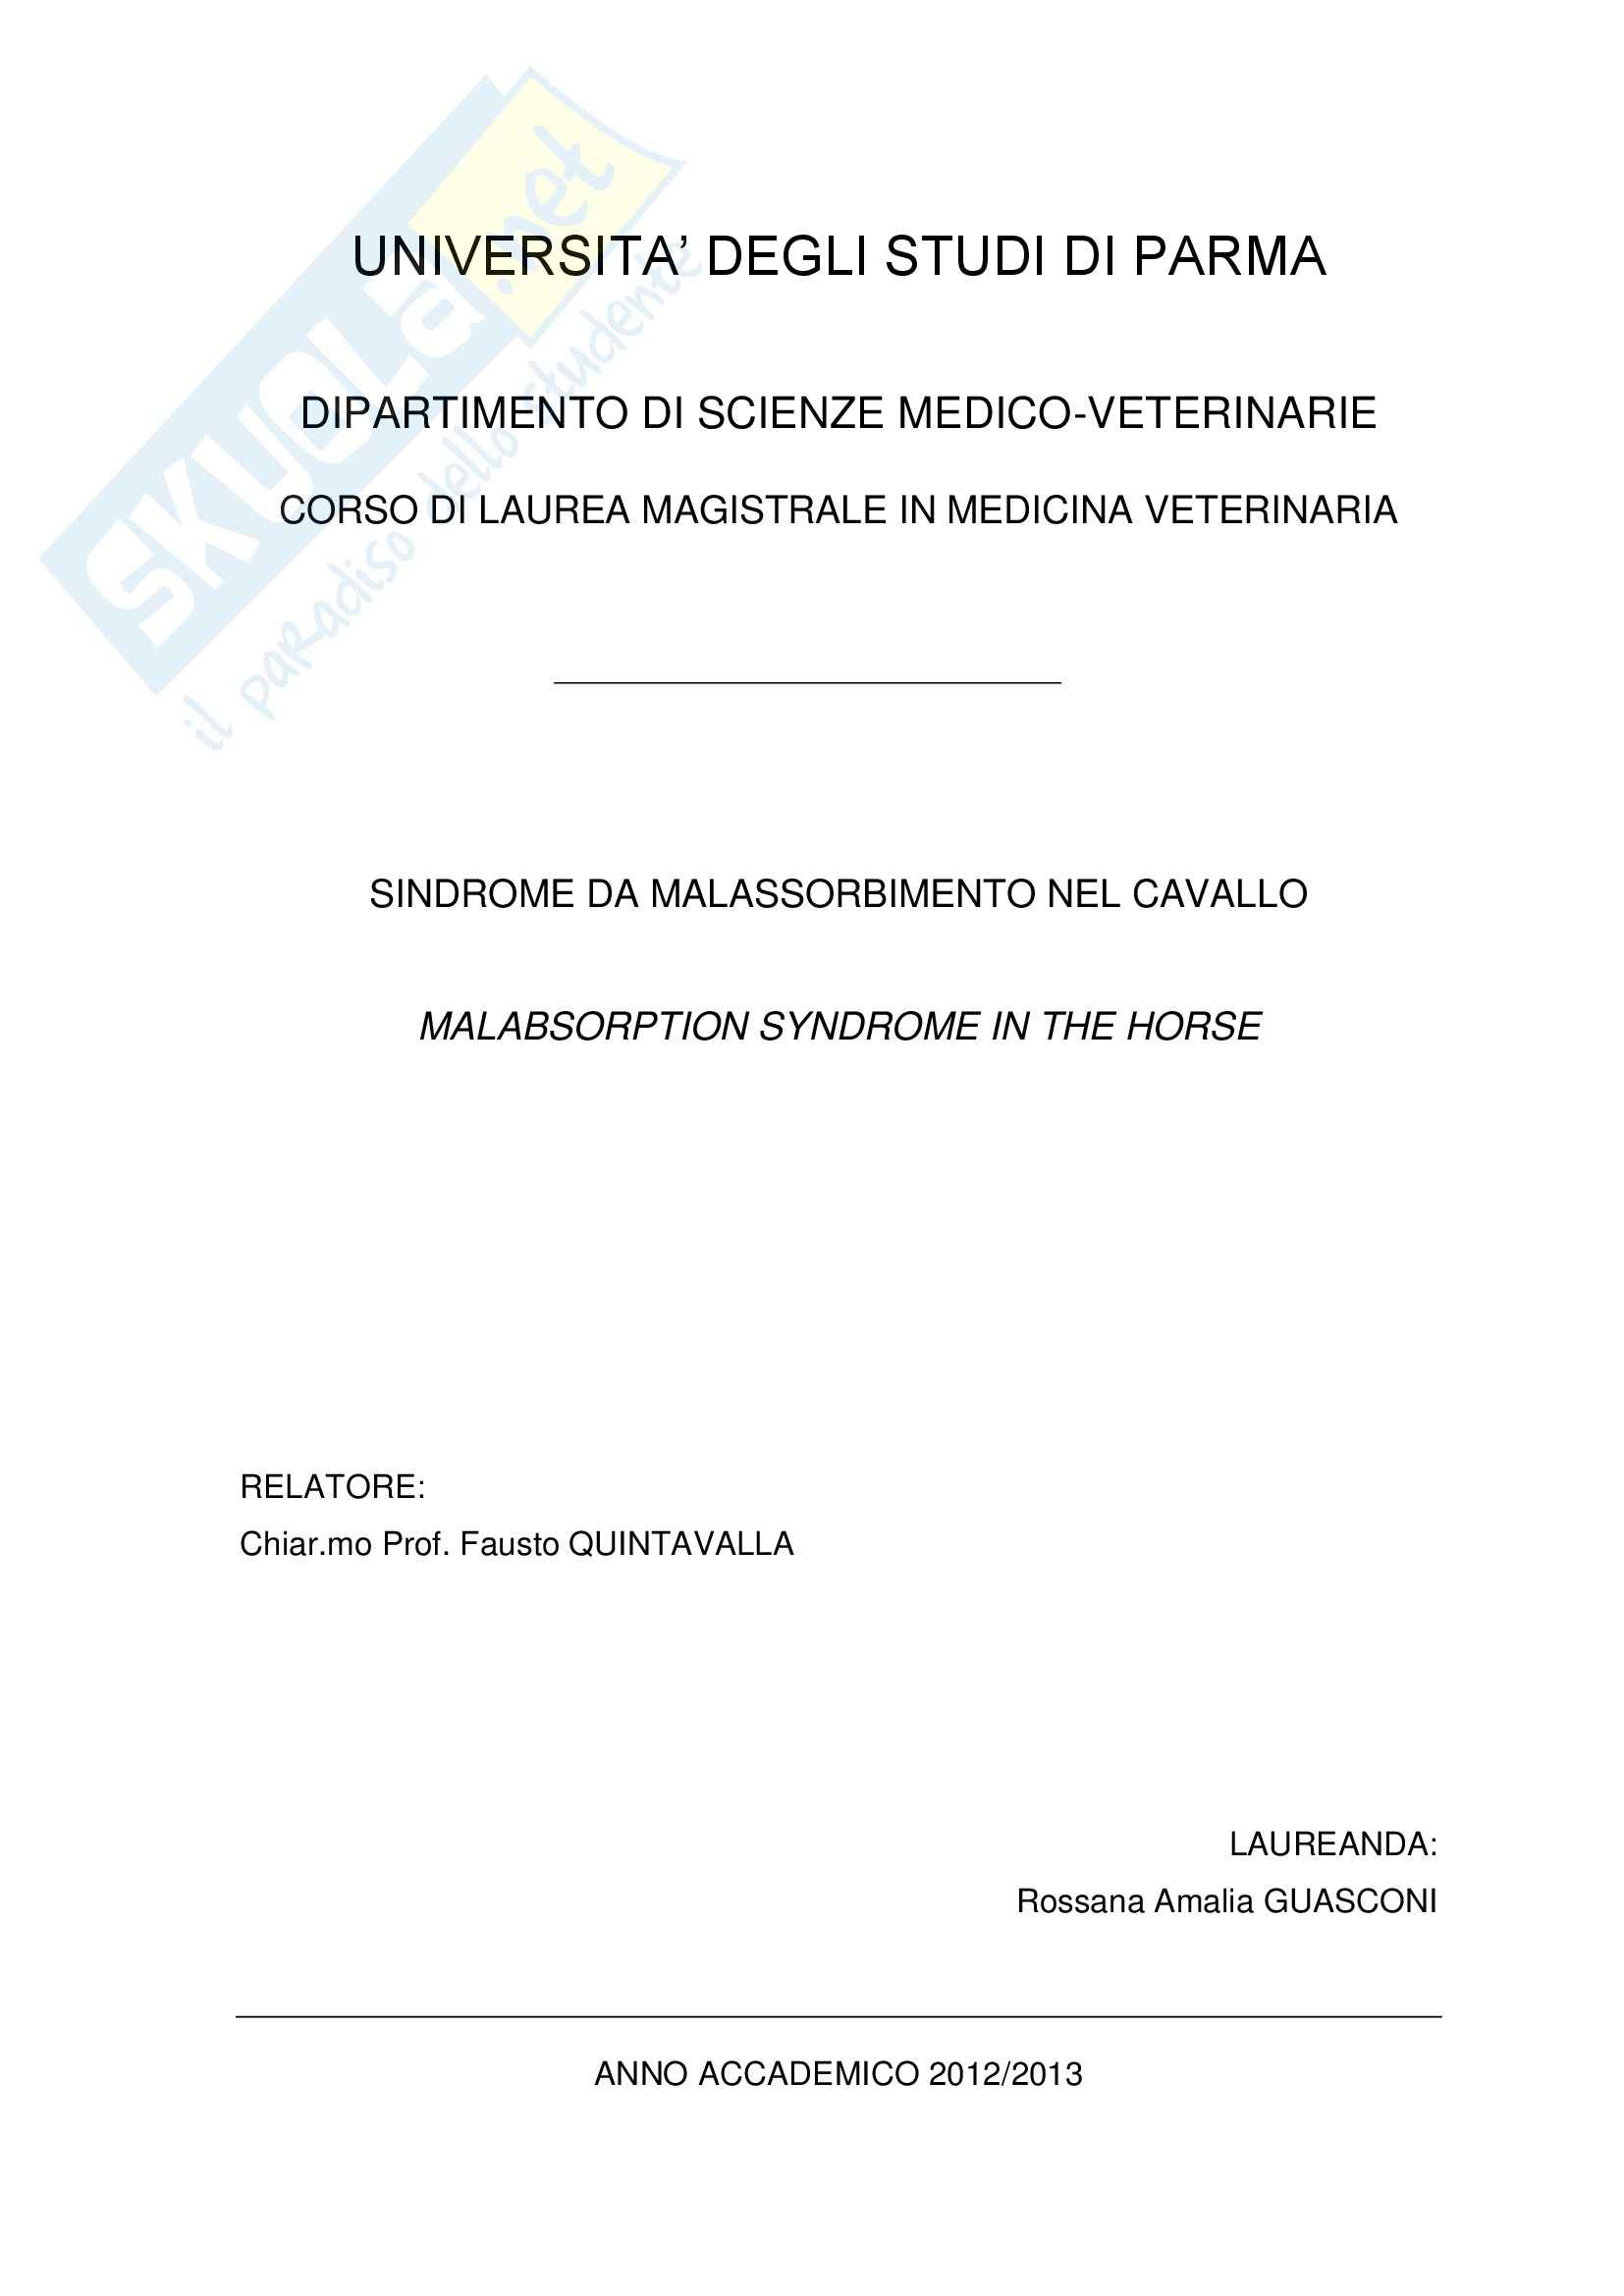 tesi F. Quintavalla Clinica medica